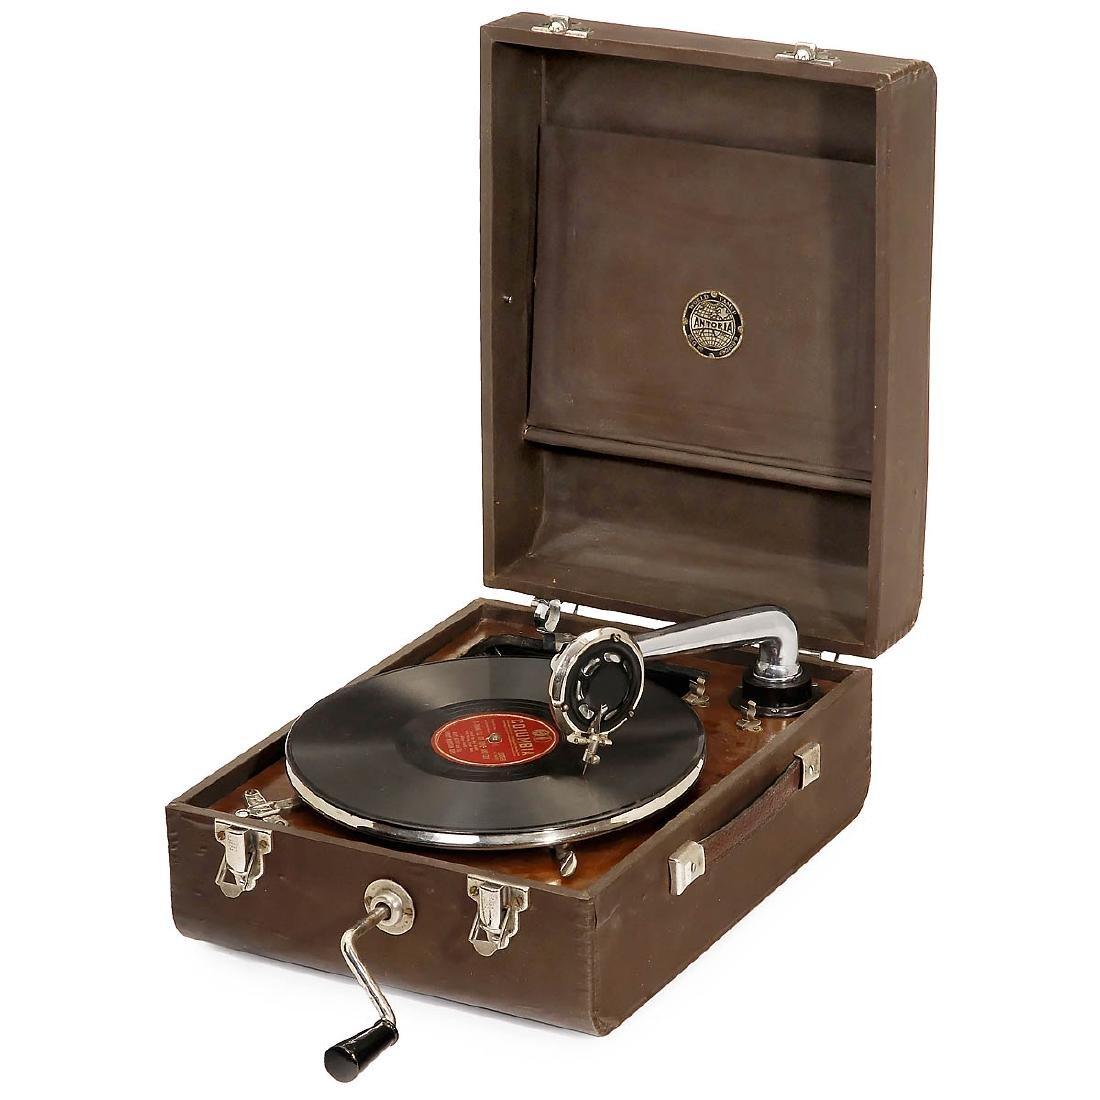 Antoria English Portable Gramophone, c. 1930